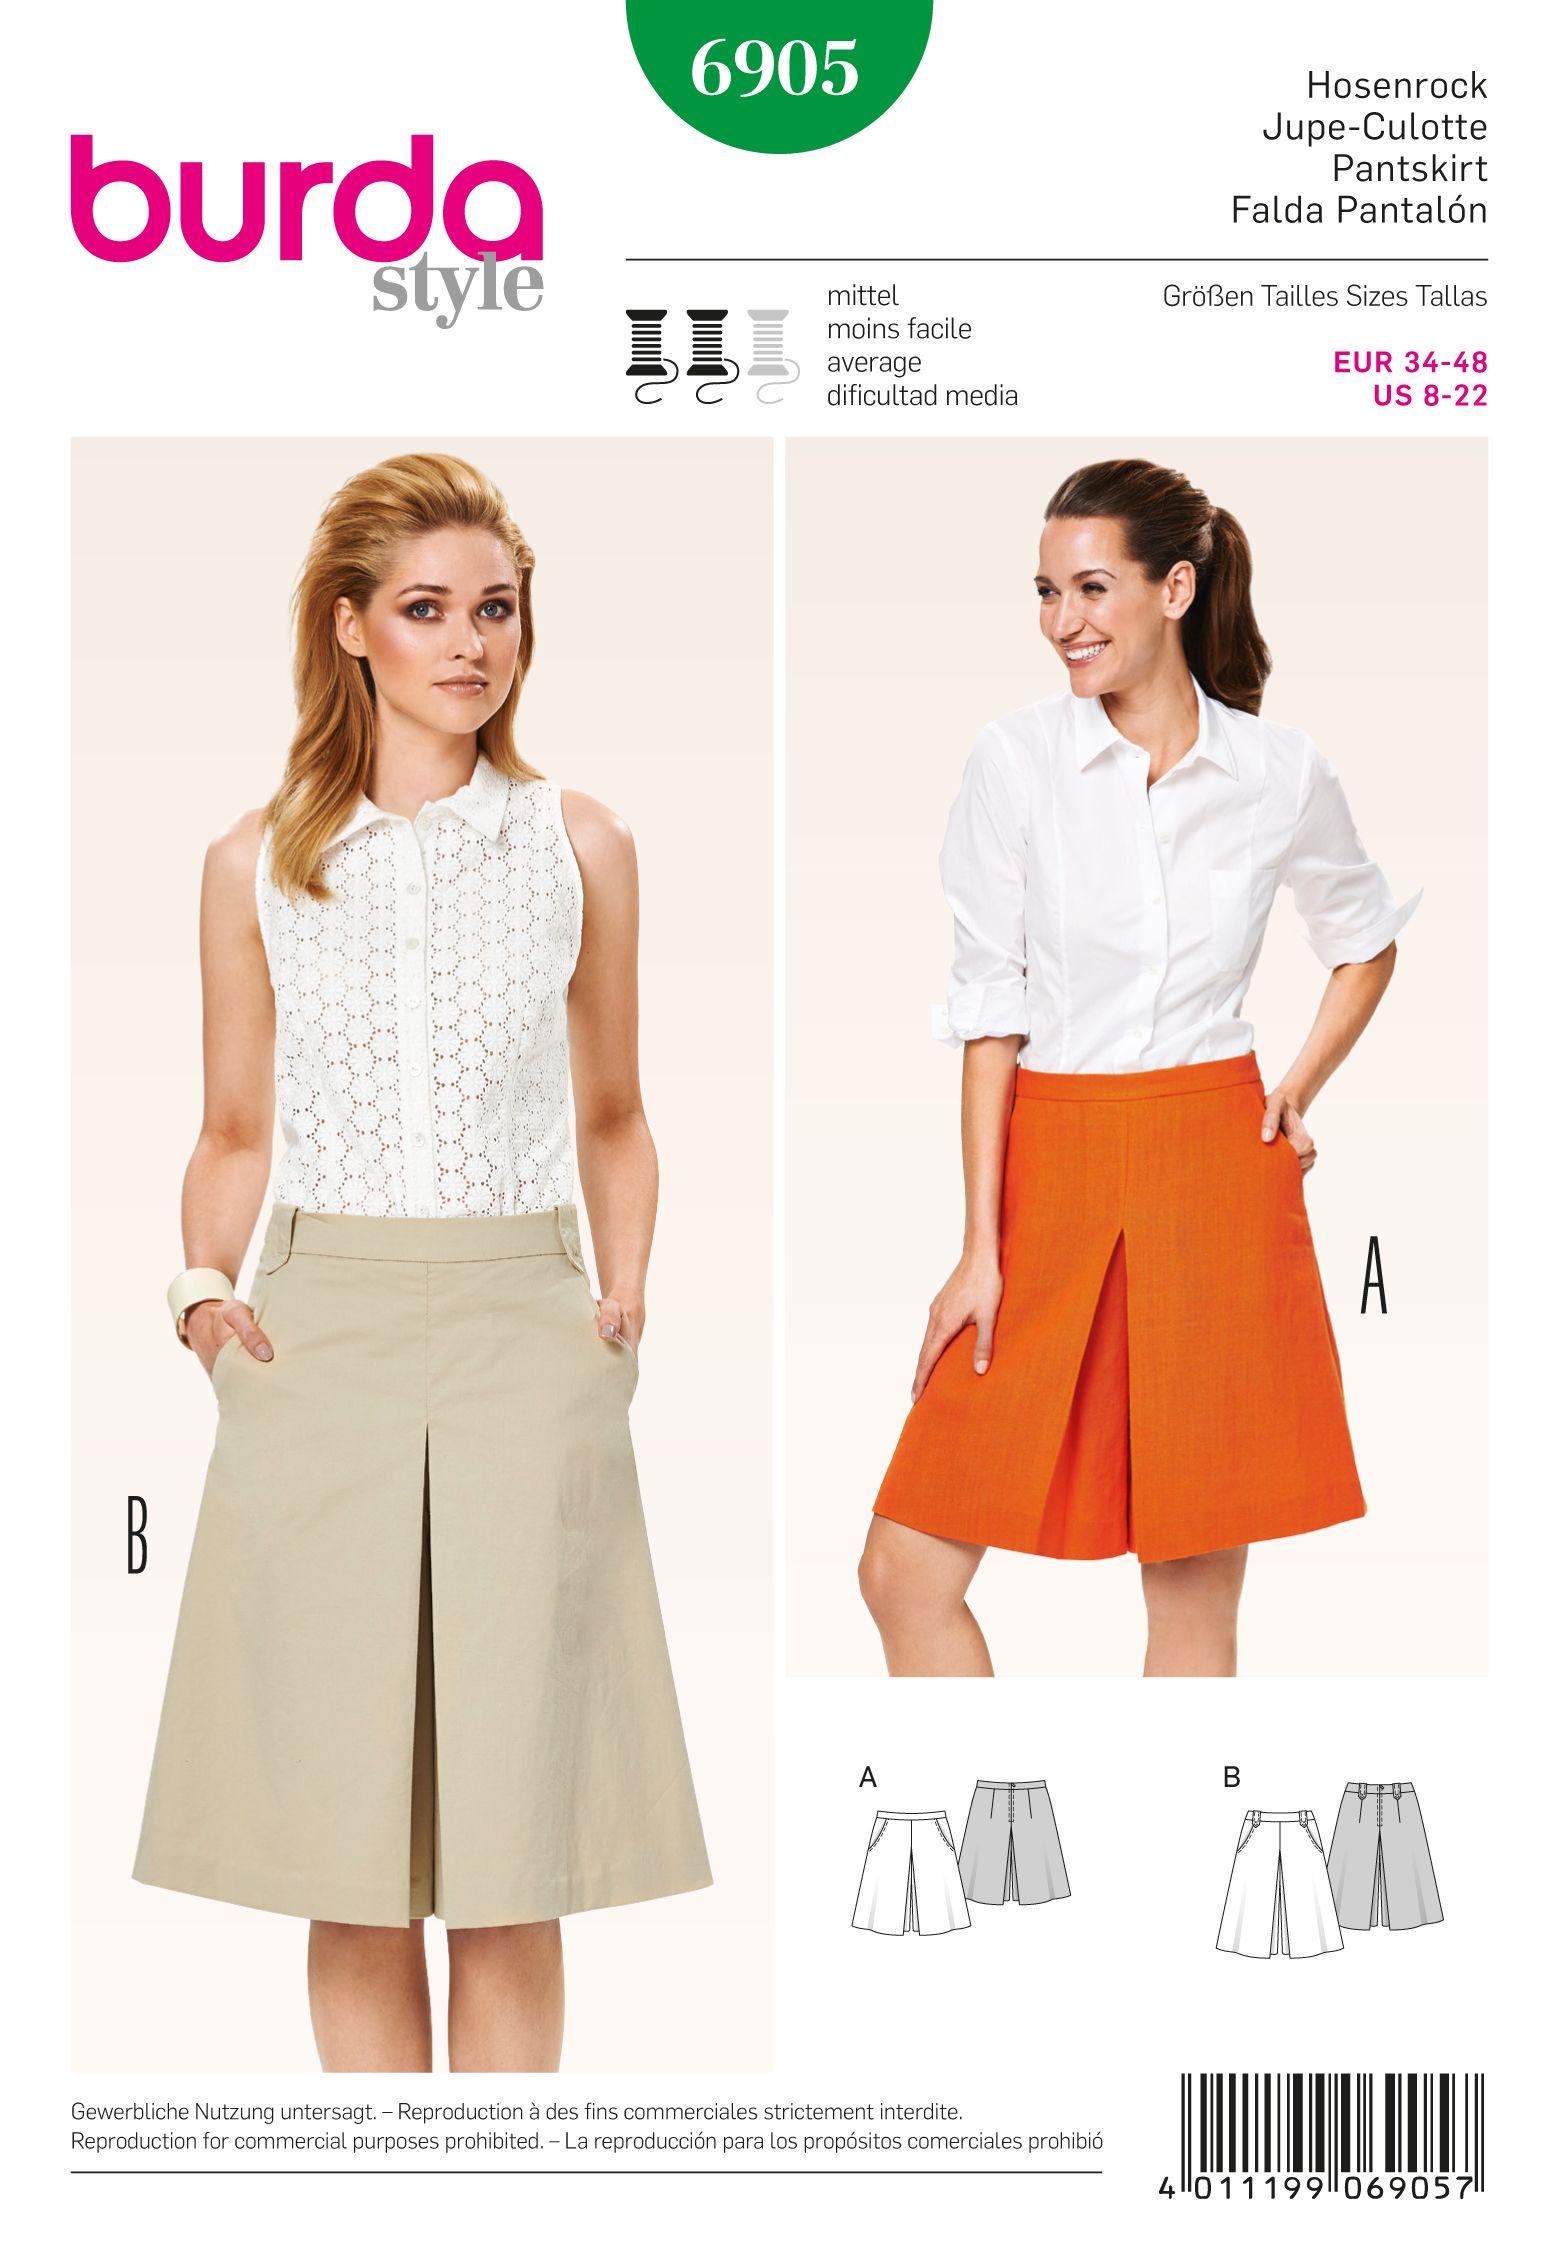 Burda B6905 Burda Style Skirts Sewing Pattern